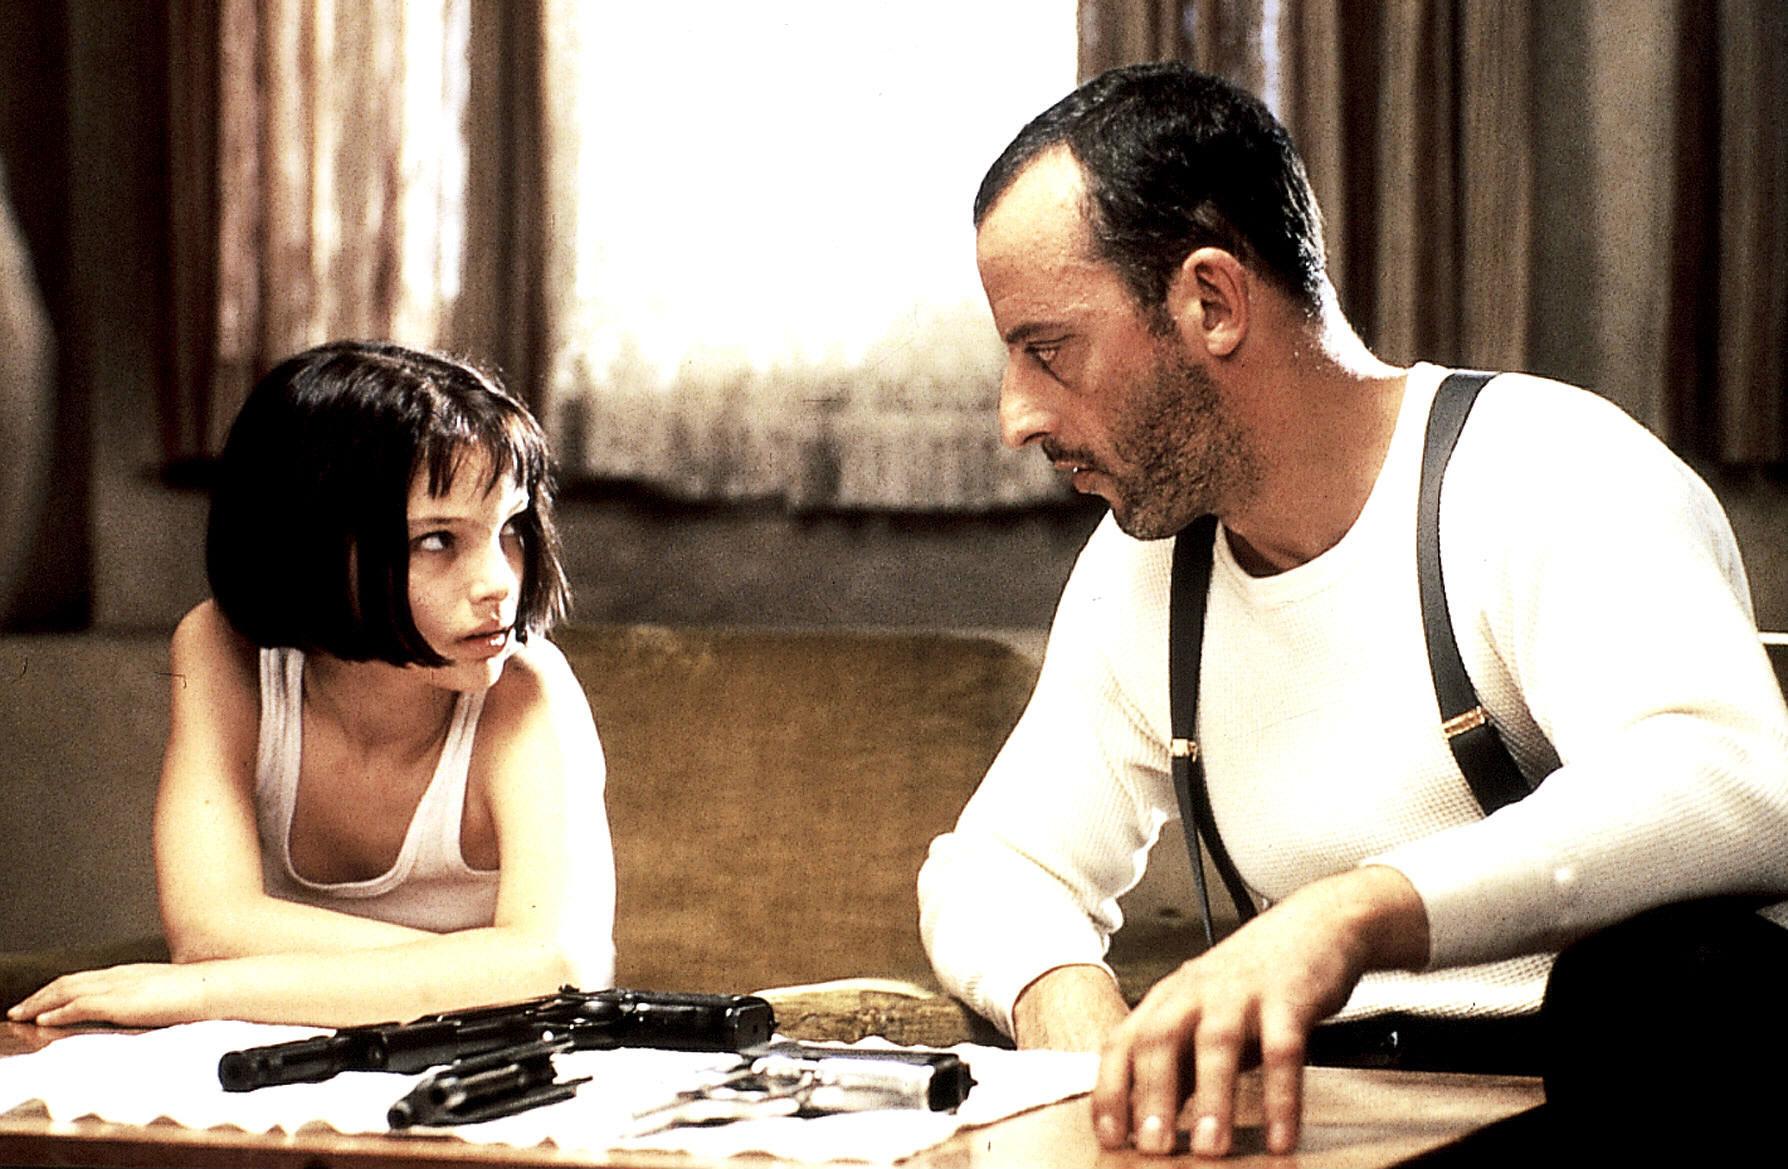 Leon filminde Natalie Portman ve Jean Reno